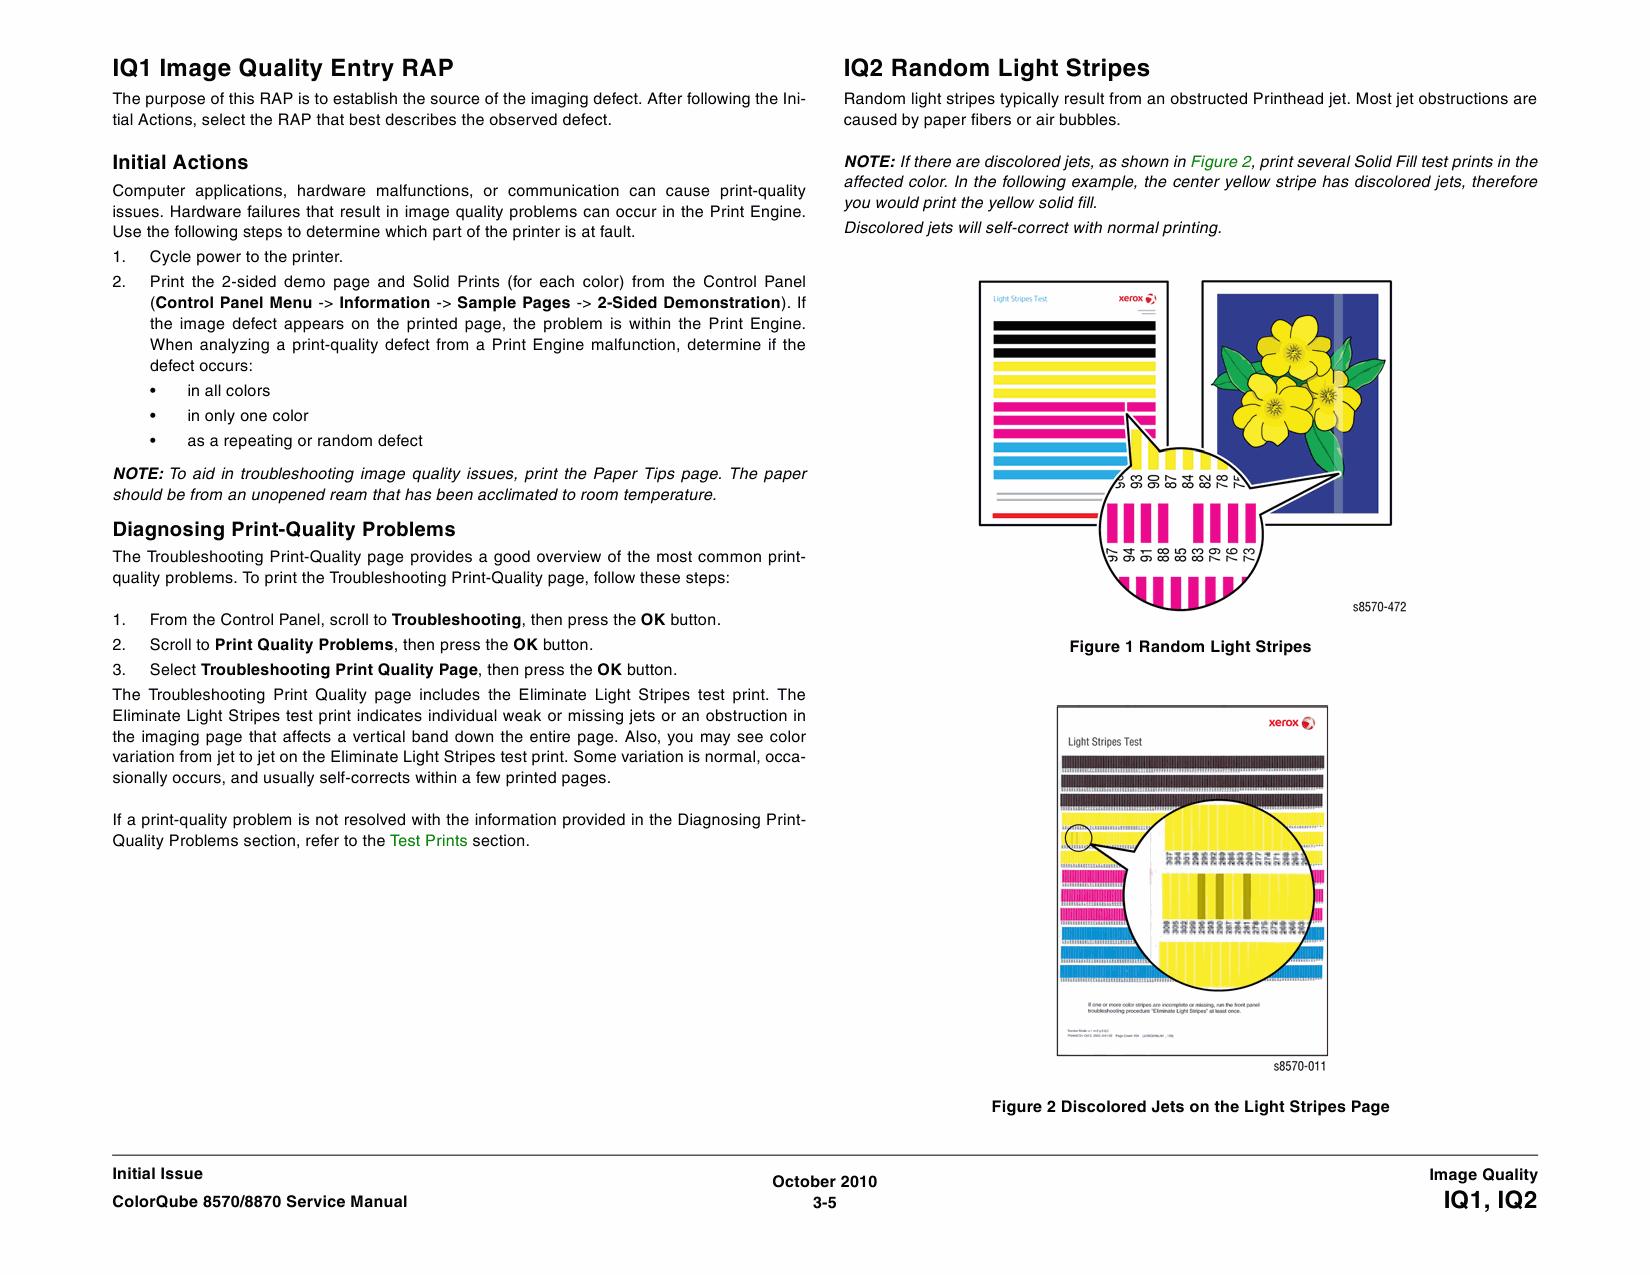 Xerox Printer ColorQube-8570 8870 Parts List and Service Manual-3